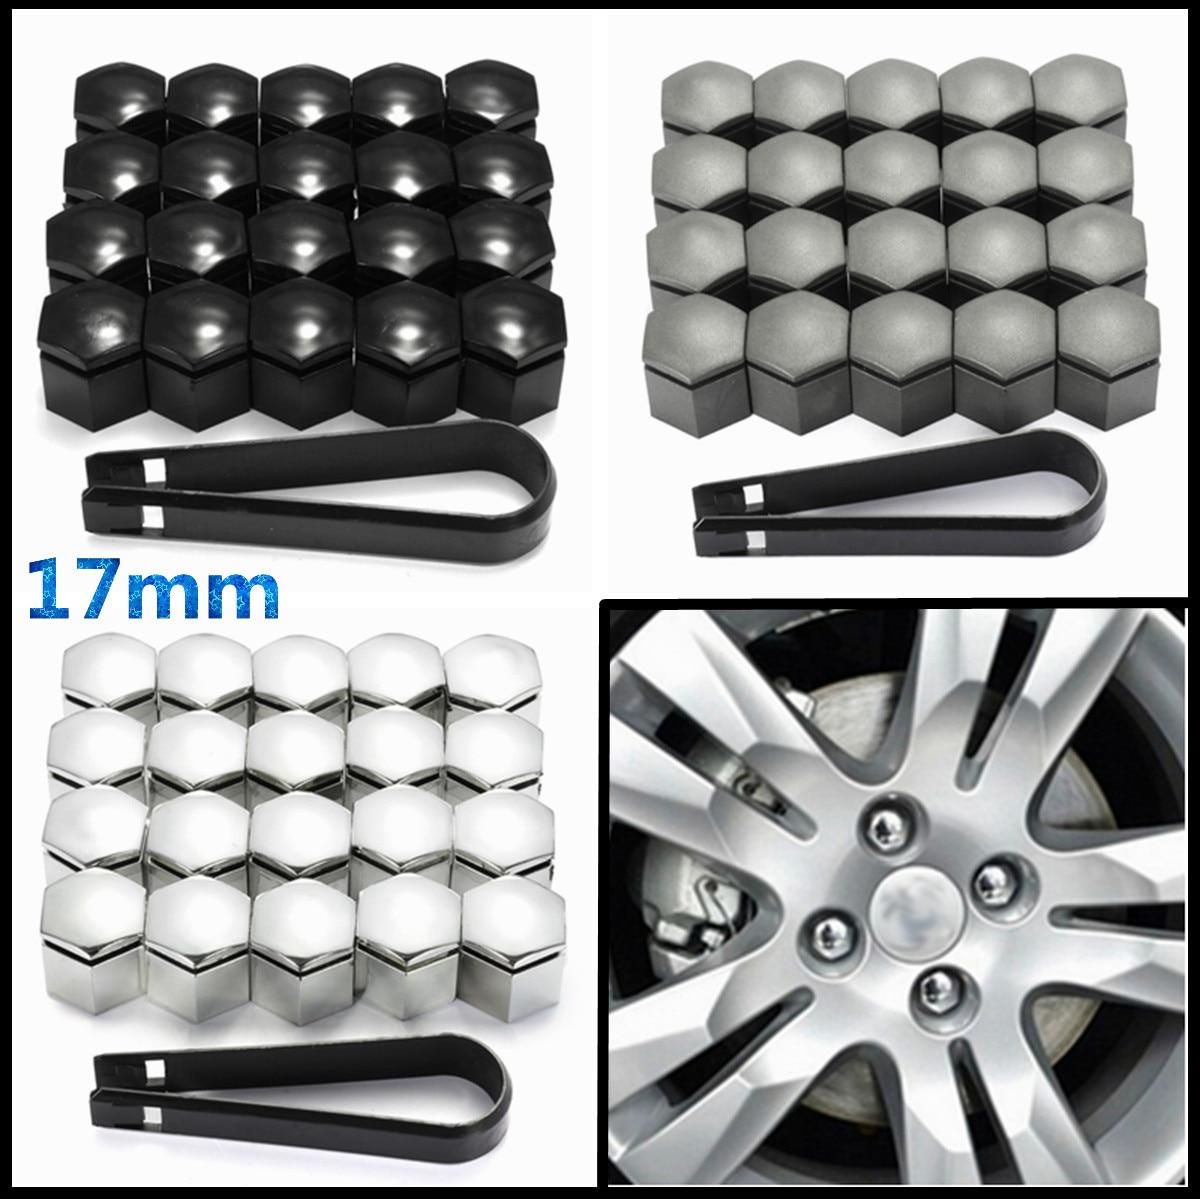 20x Alloy Wheel Nut Caps Bolt Covers Black for SEAT CAR RENAULT 17mm Car Van Bus